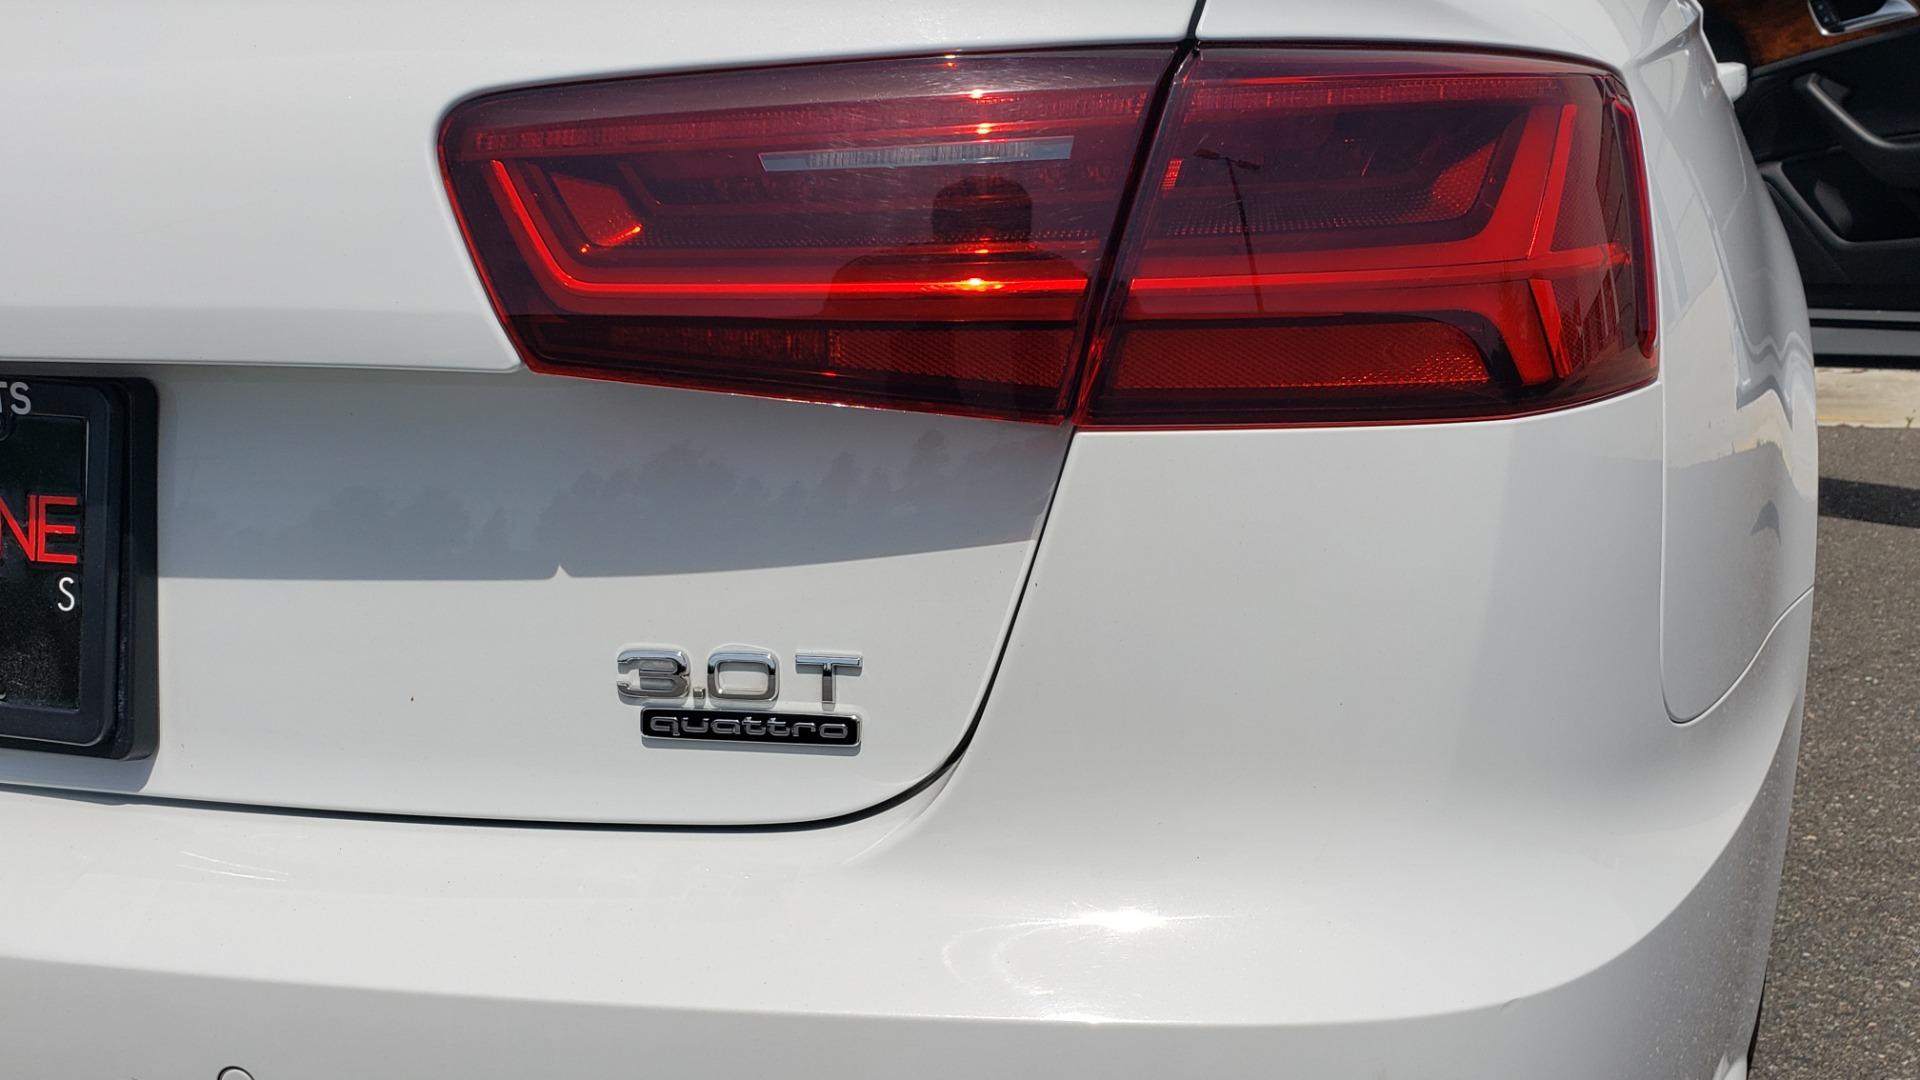 Used 2017 Audi A6 PRESTIGE SEDAN 3.0T / NAV / SUNROOF / BLACK OPTIC / CLD WTHR / REARVIEW for sale $30,797 at Formula Imports in Charlotte NC 28227 30